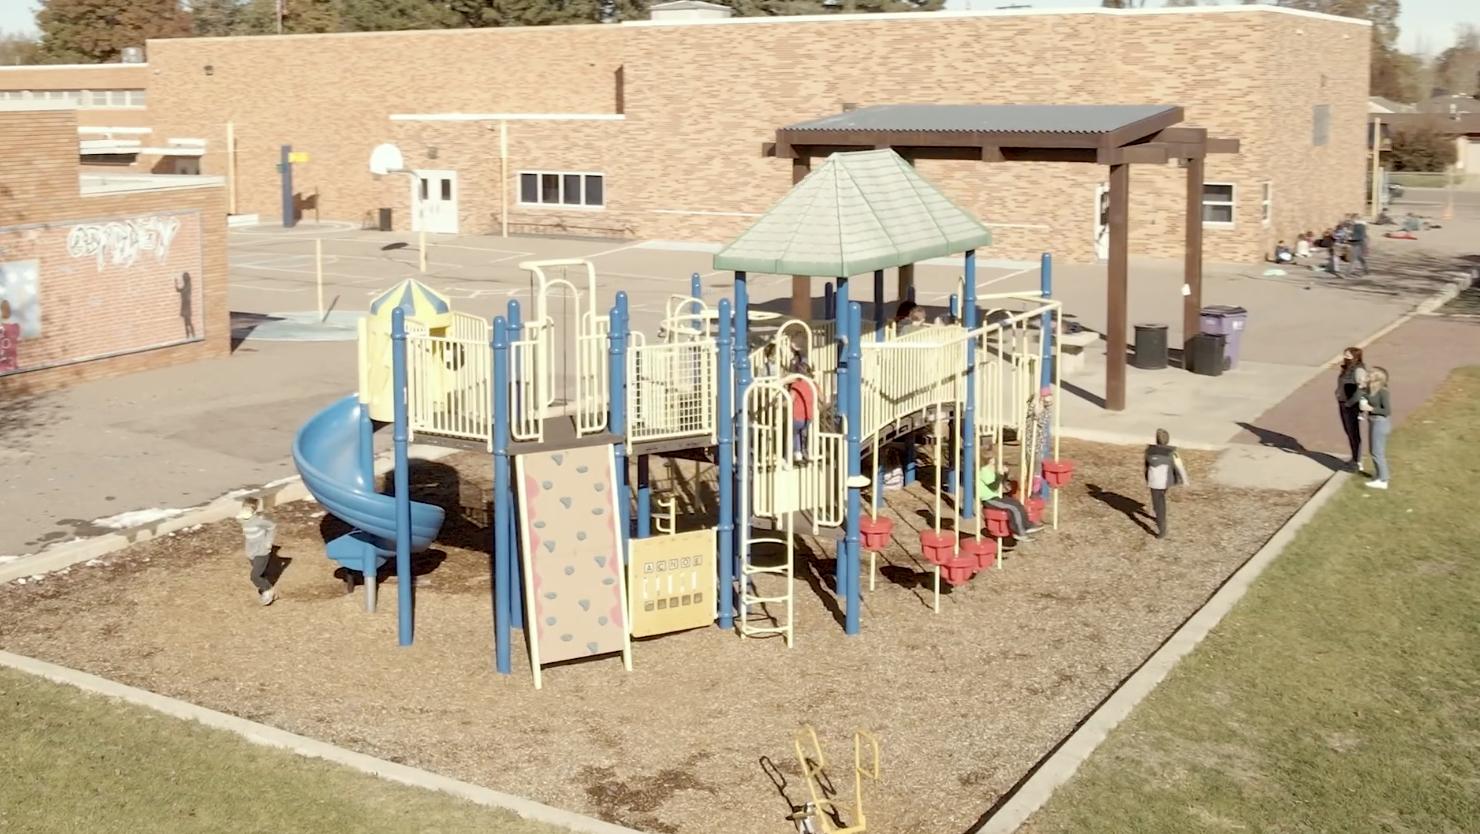 Odyssey Charter Elementary School Denver Homes For Sale Playground